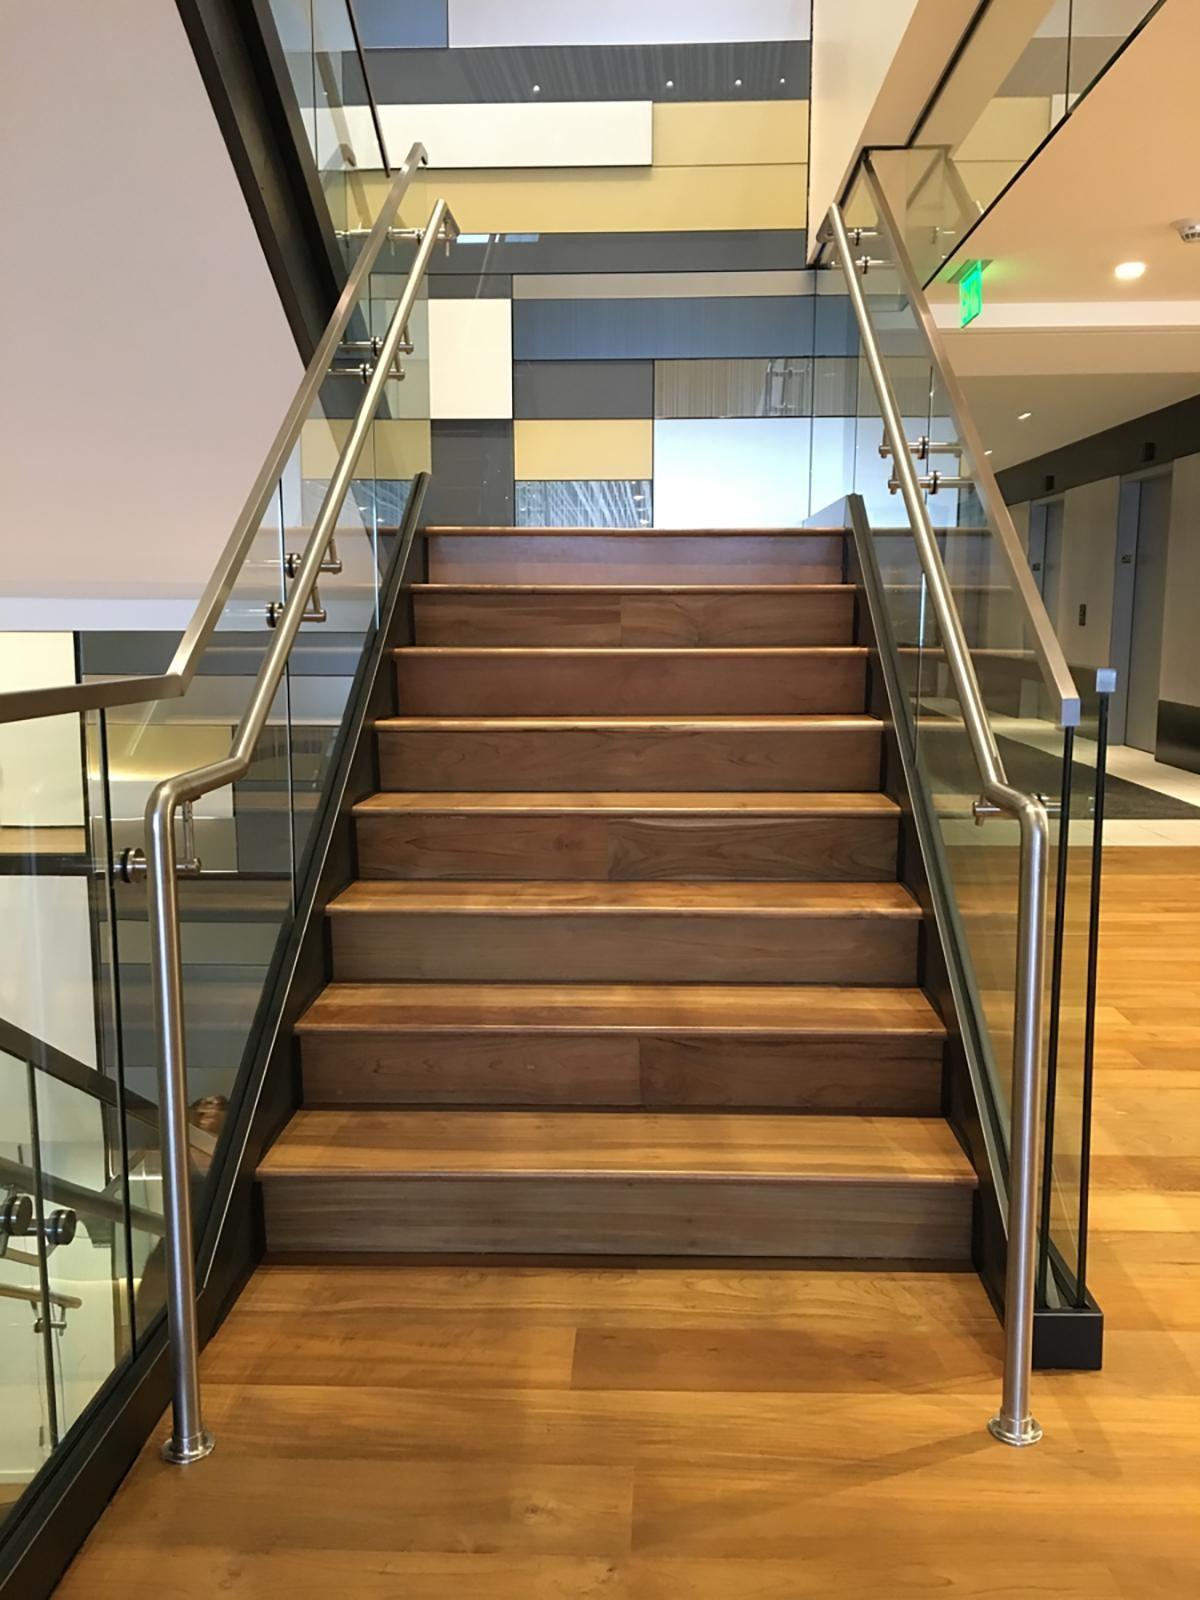 Custom Reclaimed Wooden Stairs And Treads Pioneermillworks | Stair Treads For Wood Stairs | Anti Slip Stair | Stair Nosing | Stair Risers | Hardwood Flooring | Examples Terramai